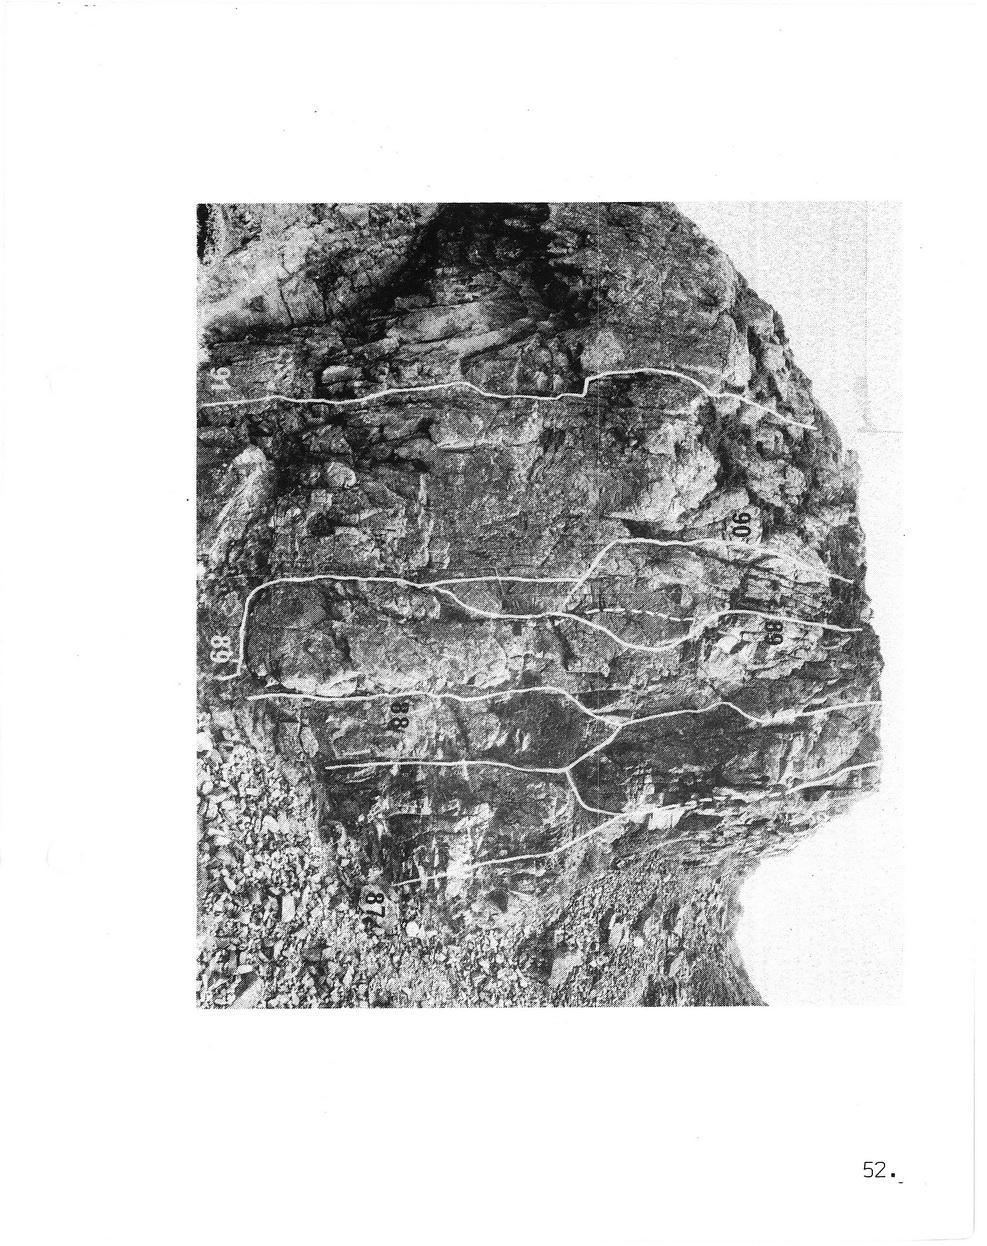 Kullen guide 1972 052.jpg